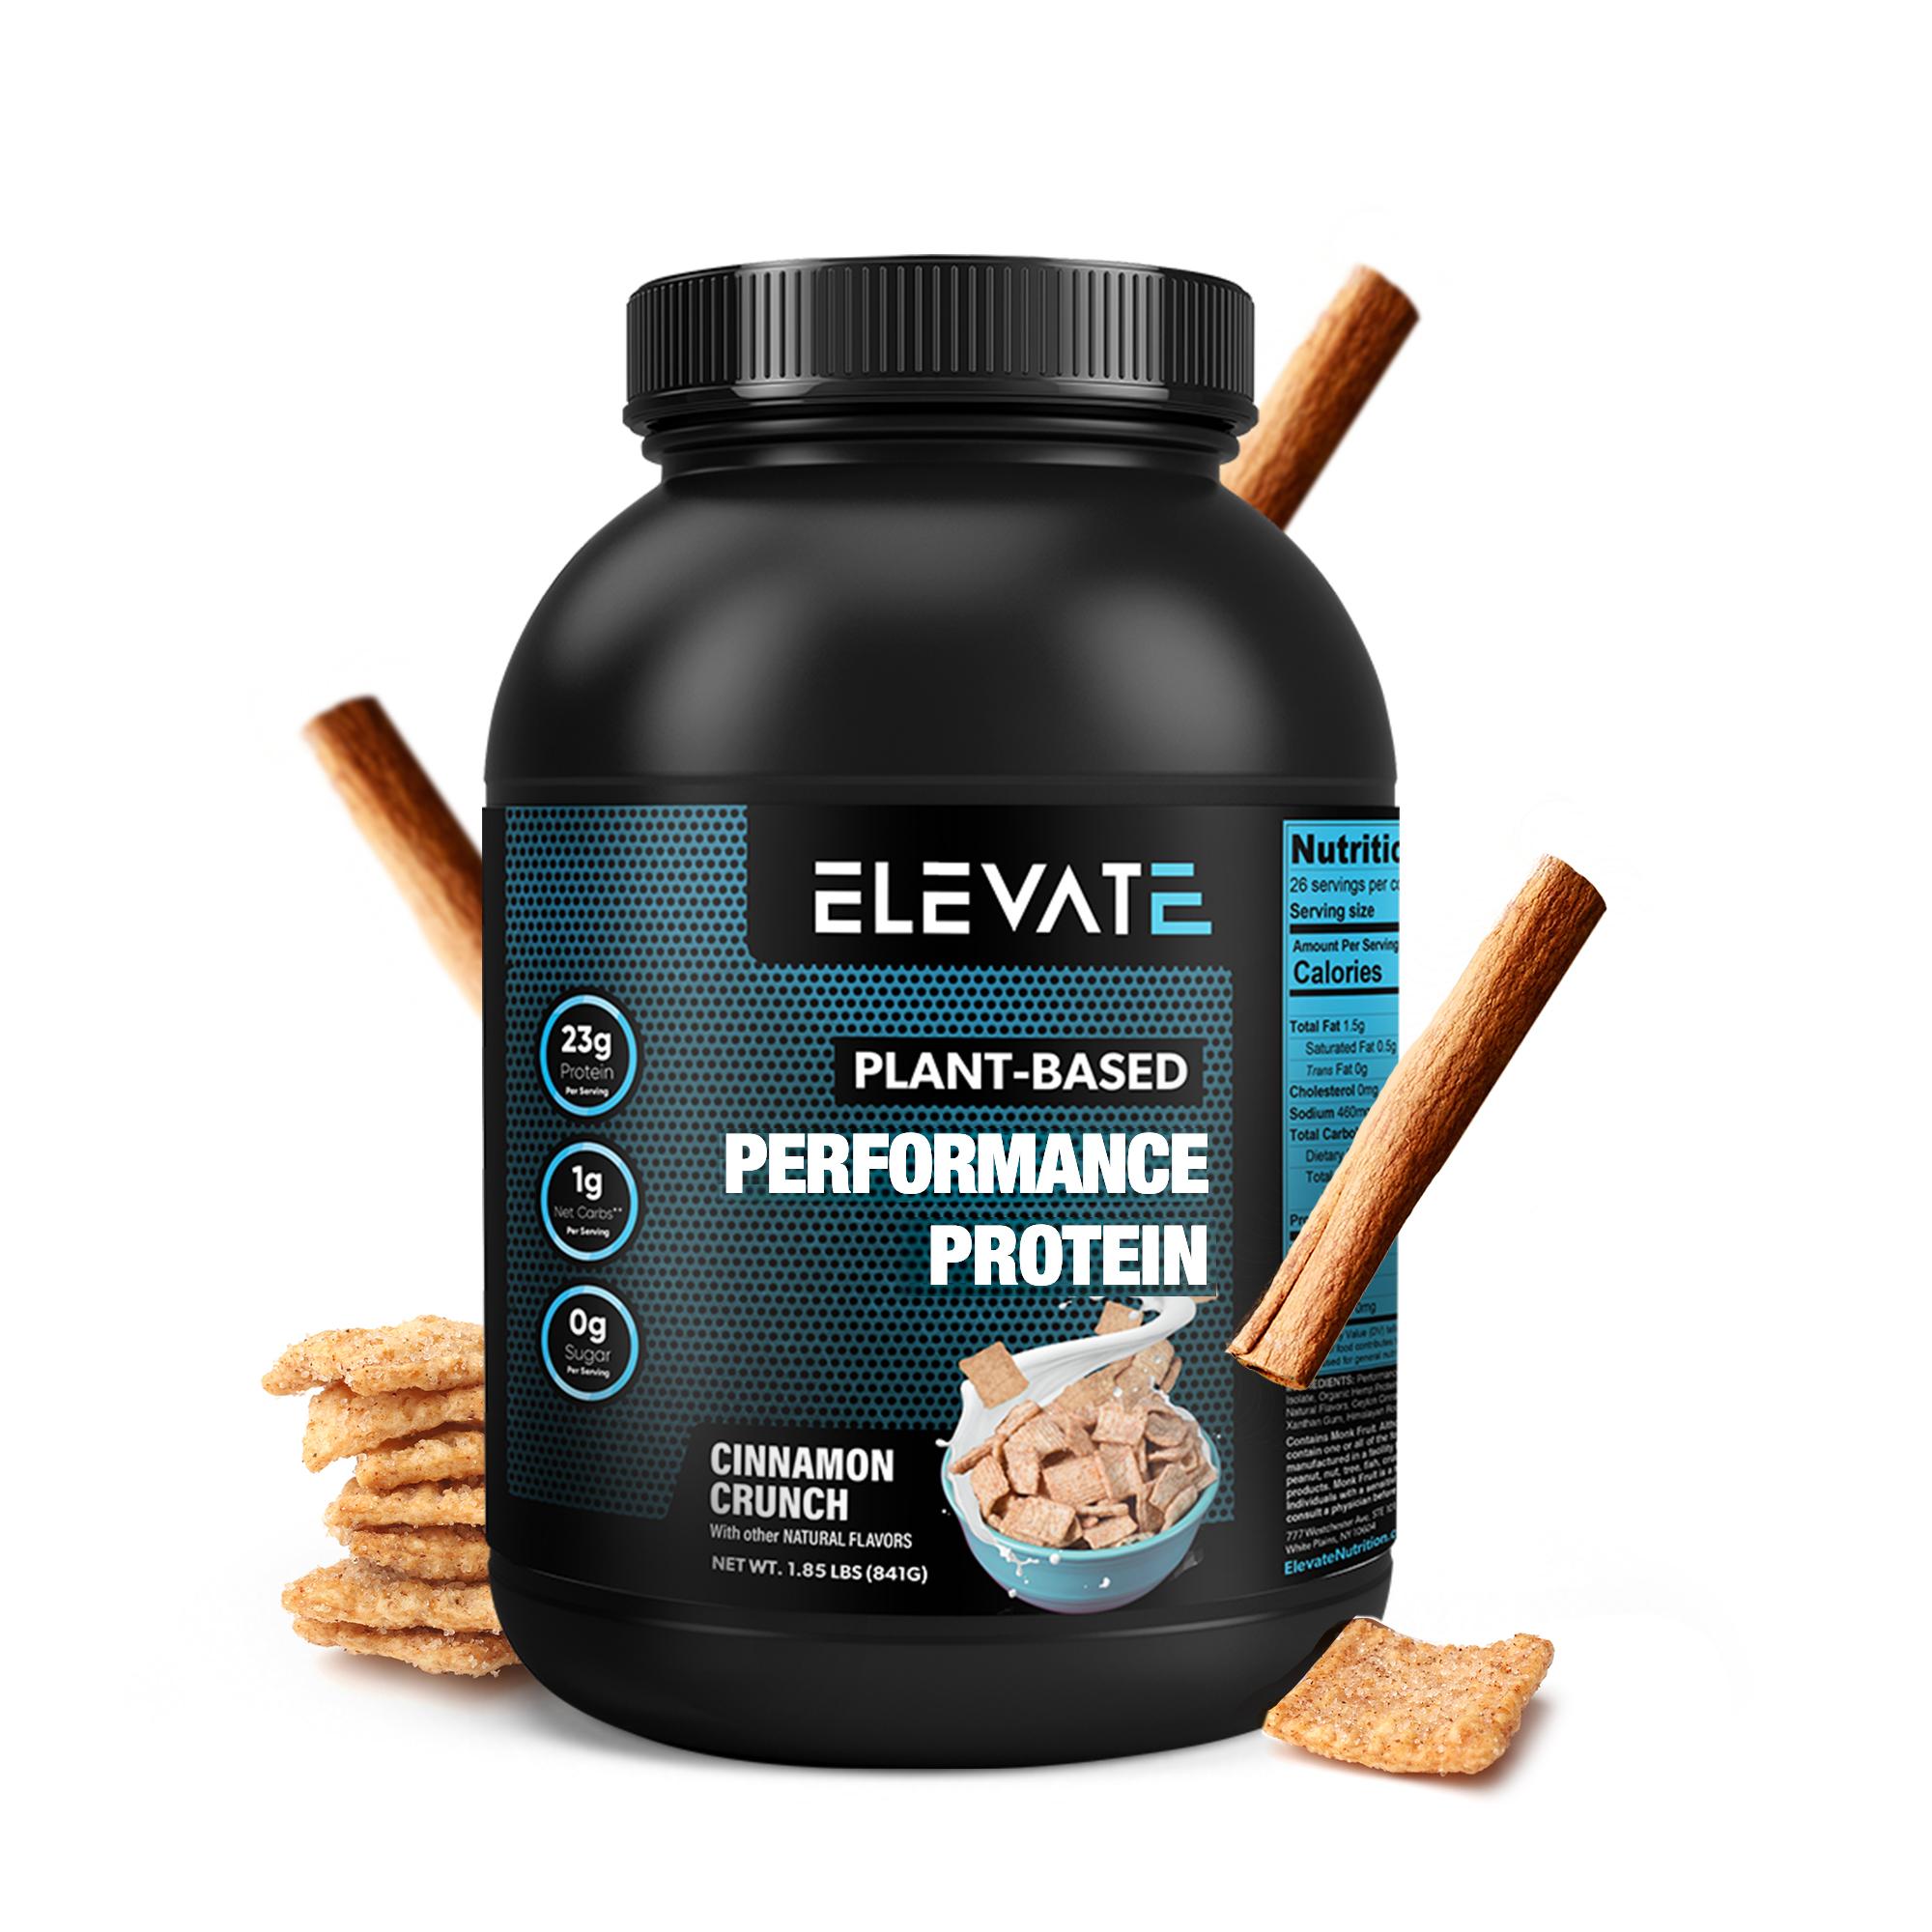 plant-based-cinnamon-crunch-protein-powder-by-Elevate-Nutrition